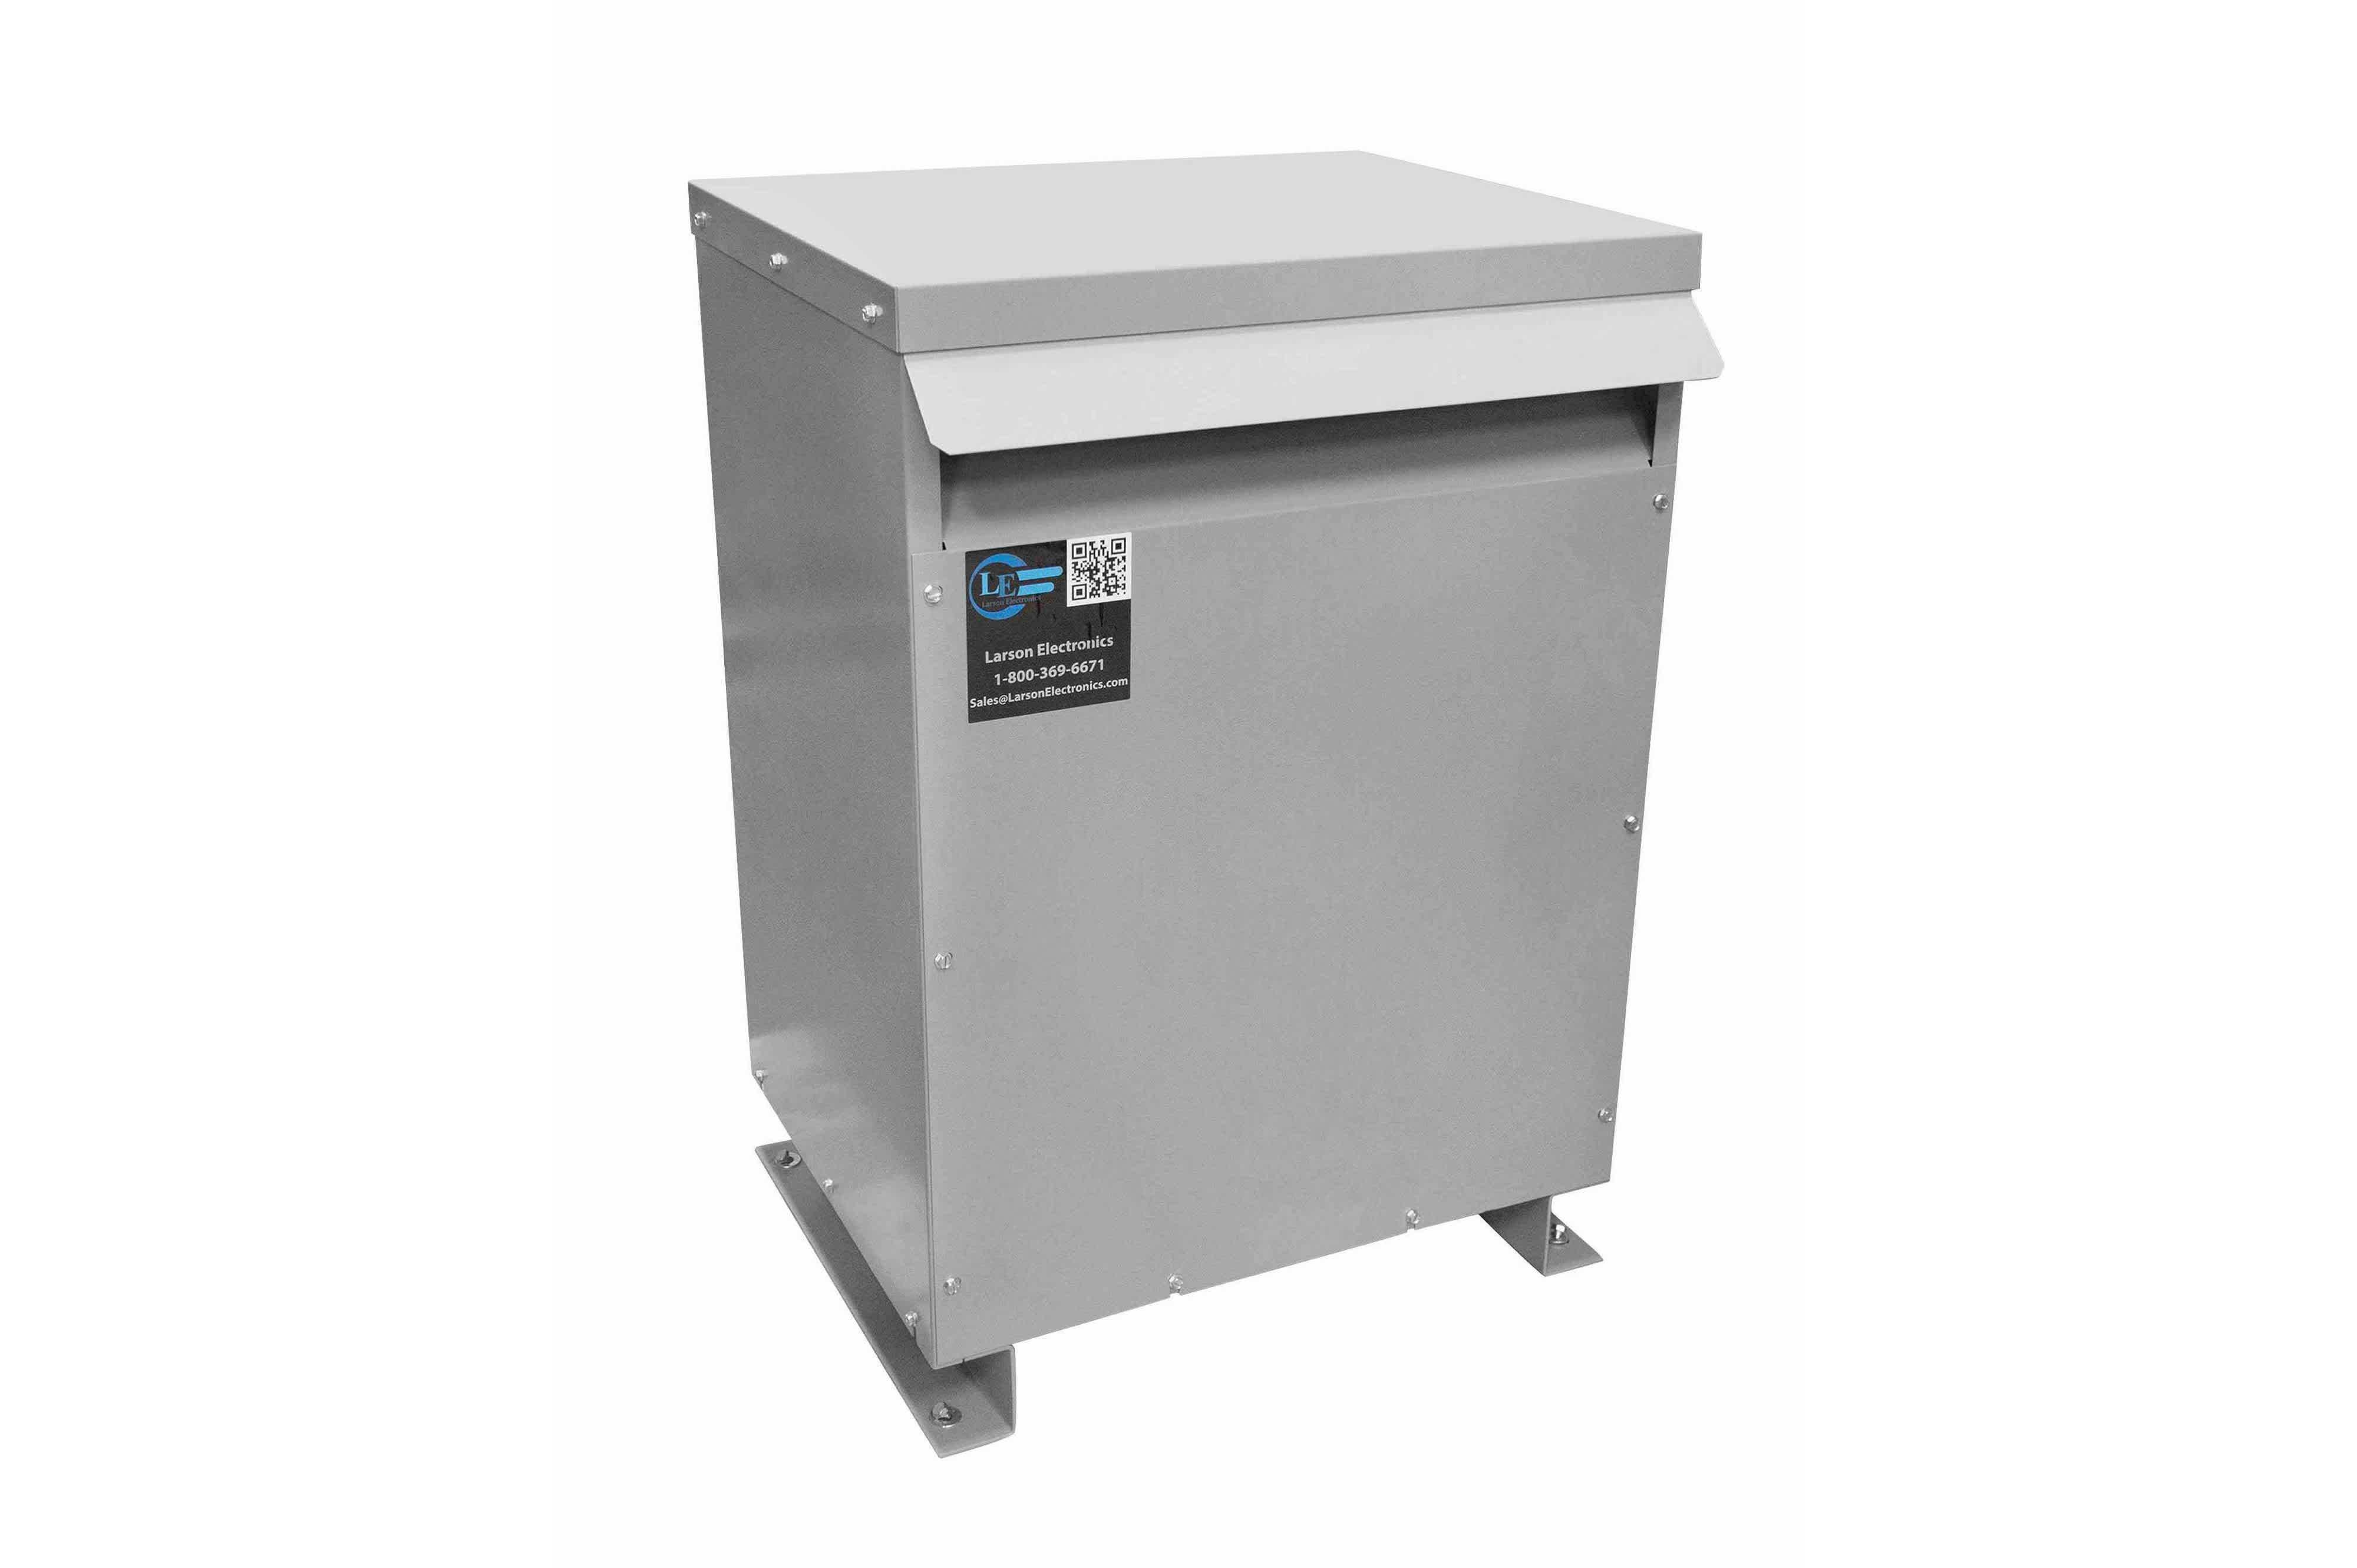 28 kVA 3PH Isolation Transformer, 440V Wye Primary, 208Y/120 Wye-N Secondary, N3R, Ventilated, 60 Hz